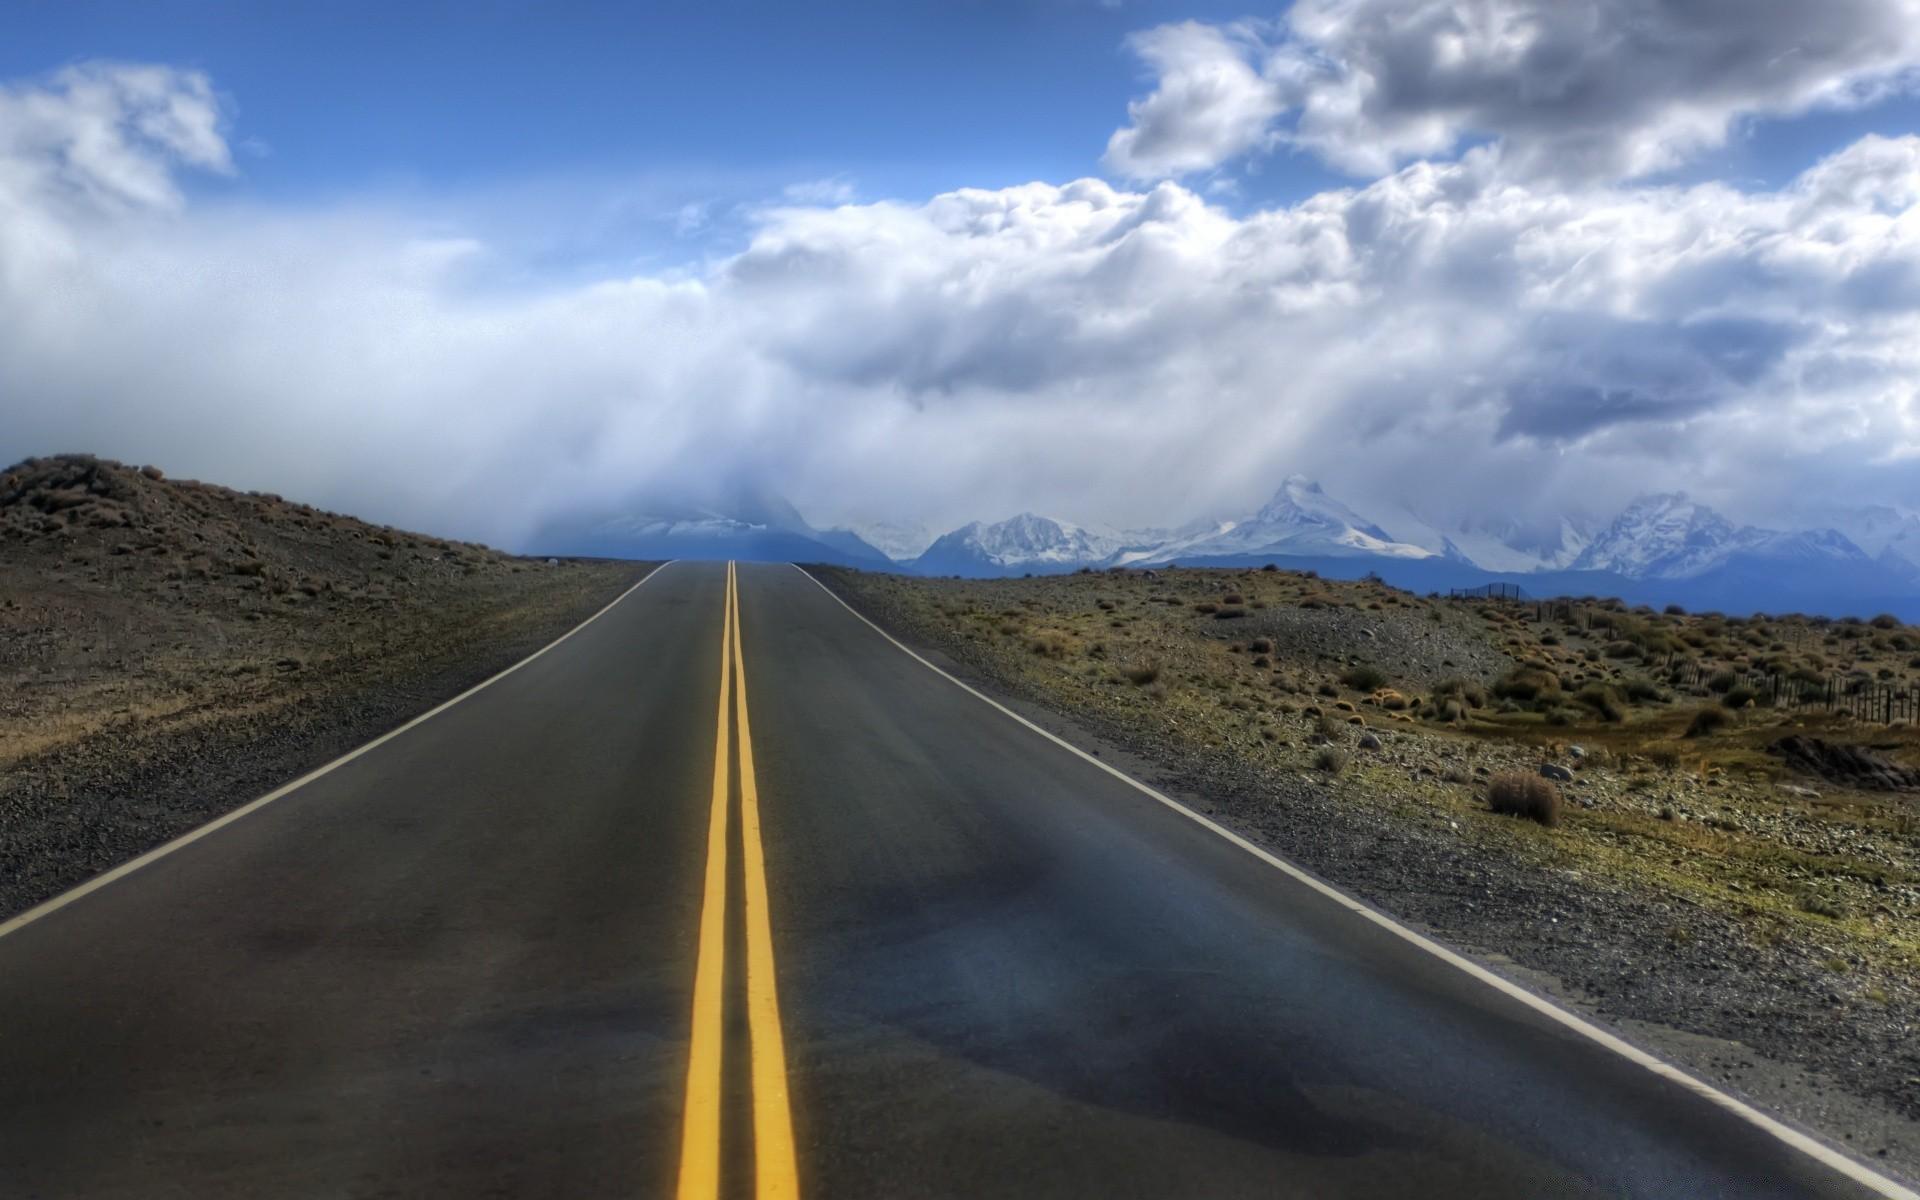 Картинка дорога в даль